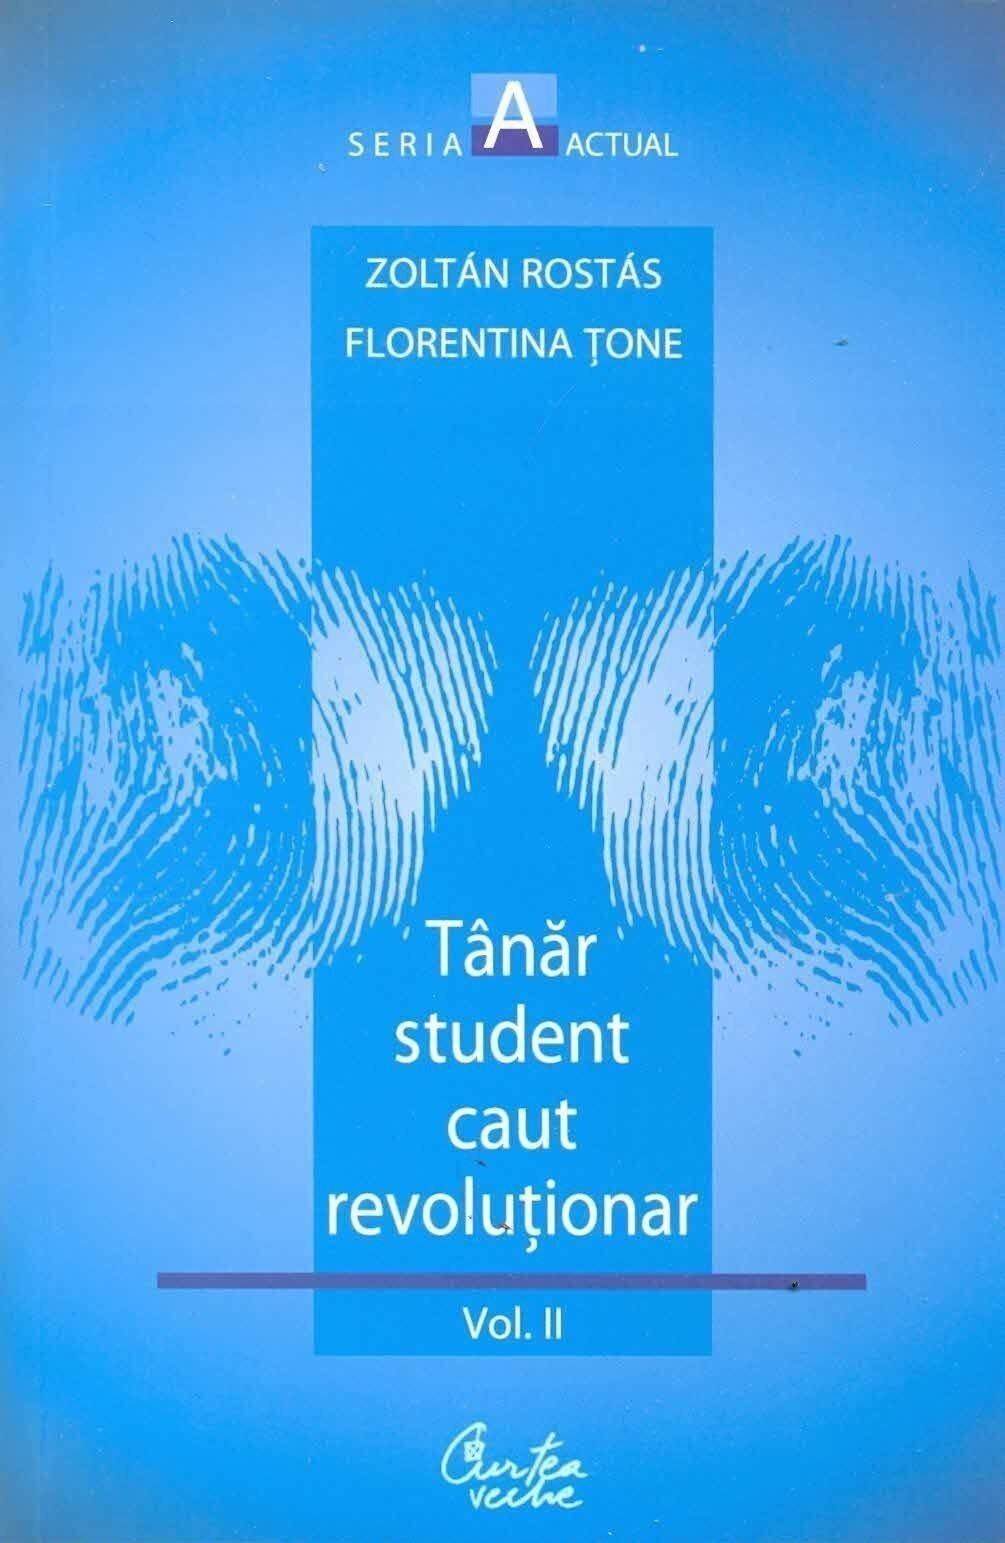 Tanar student caut revolutionar. Vol. 2. Voiam altceva, dar nu aveam in gand ceva anume